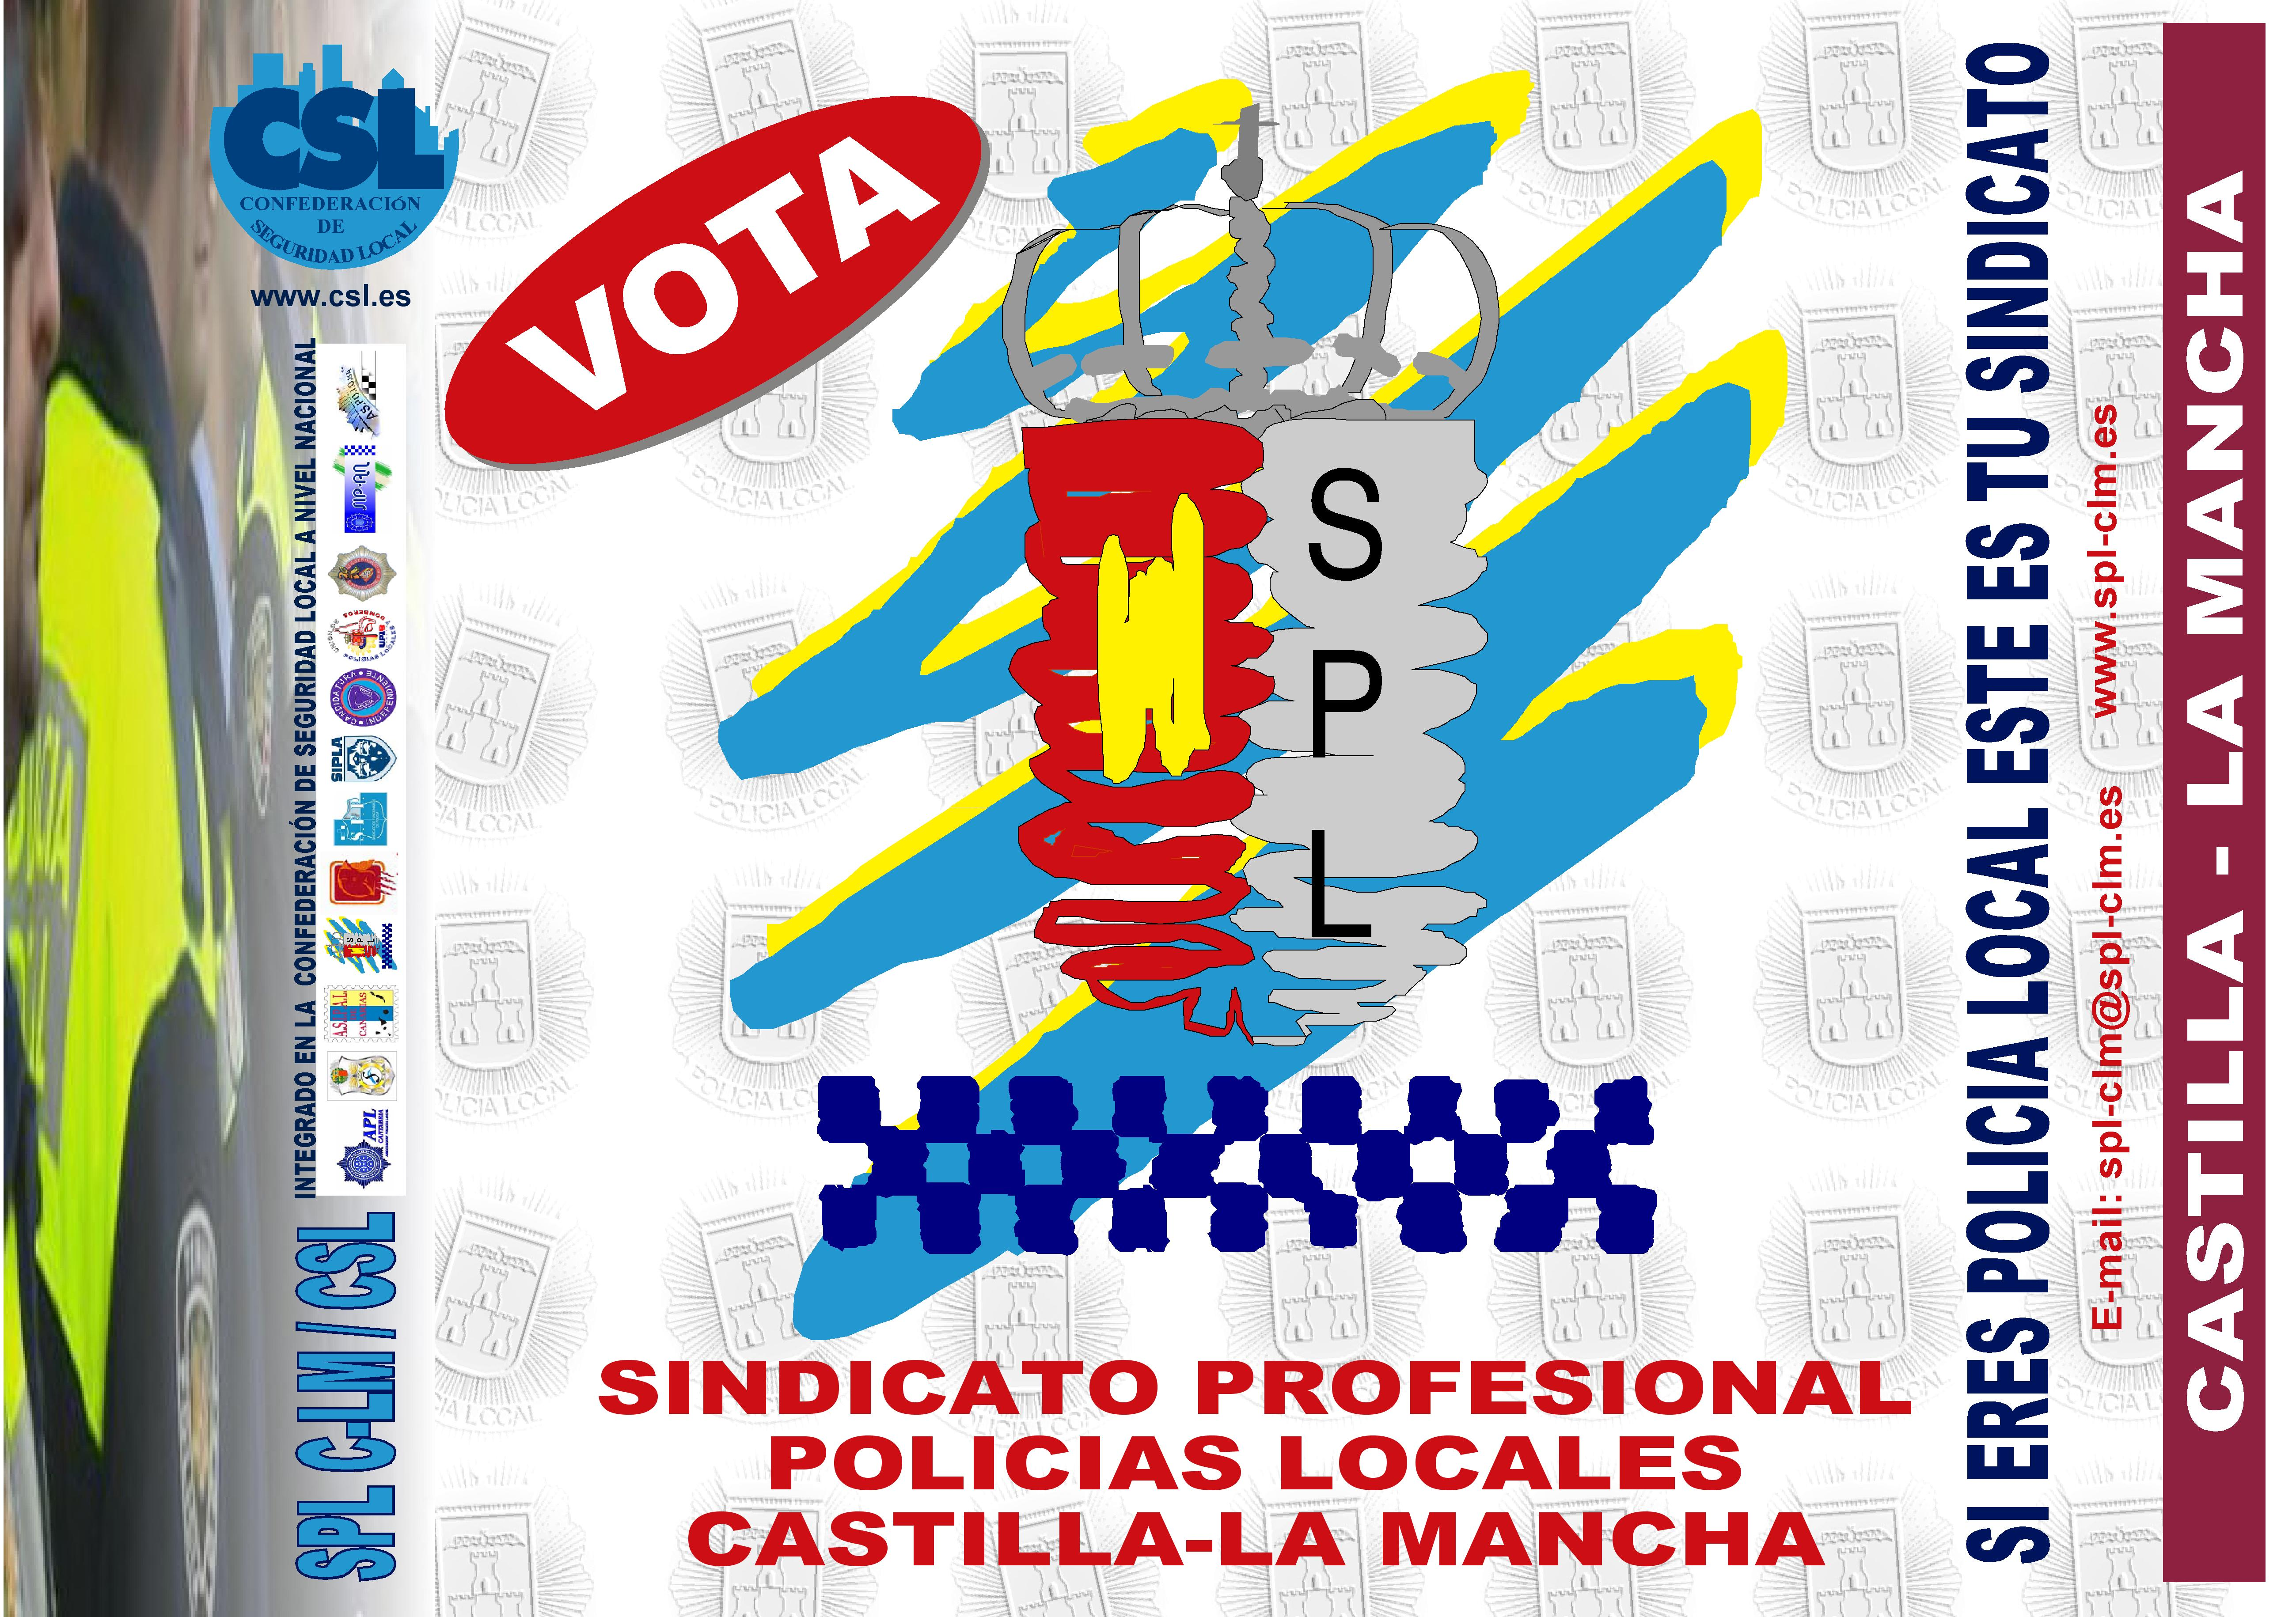 CARTEL ELECCIONES 2011 VOTA SPL ESCUDO